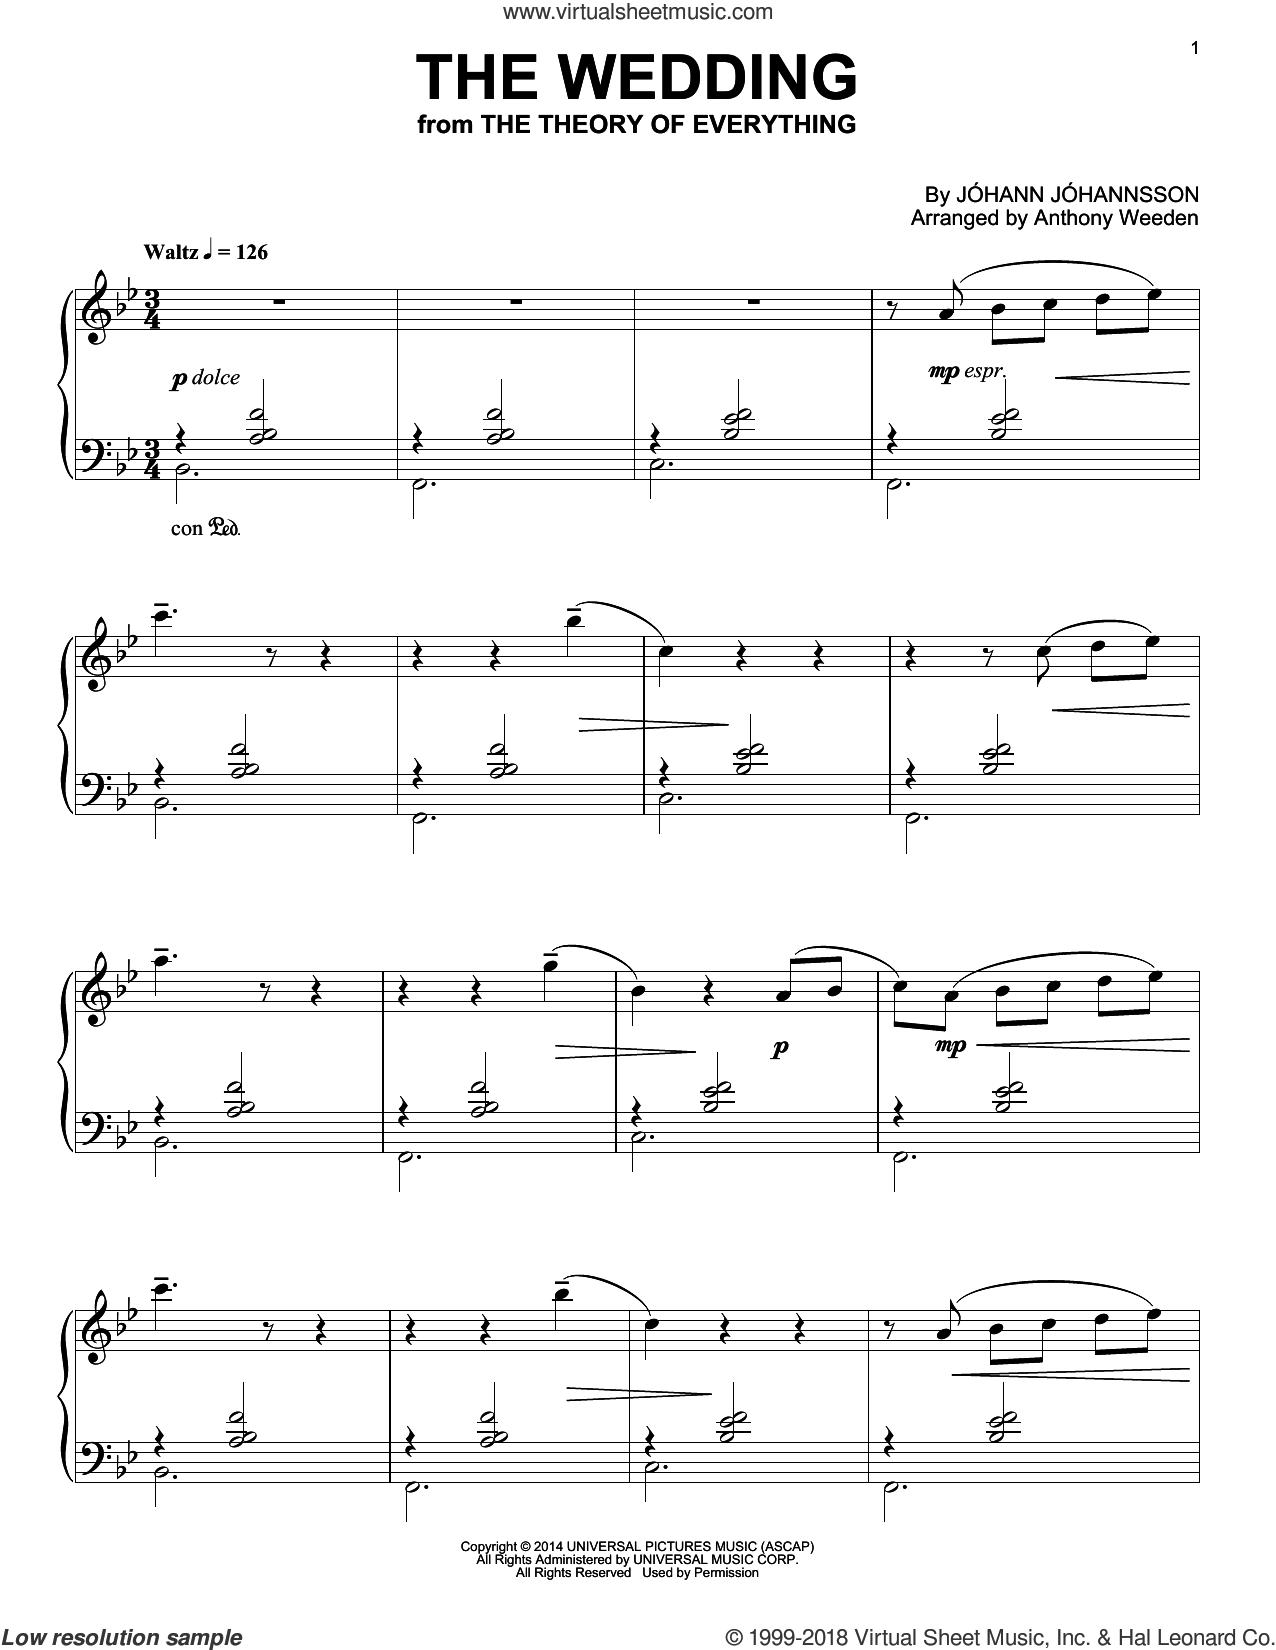 The Wedding sheet music for piano solo by Johann Johannsson, intermediate skill level